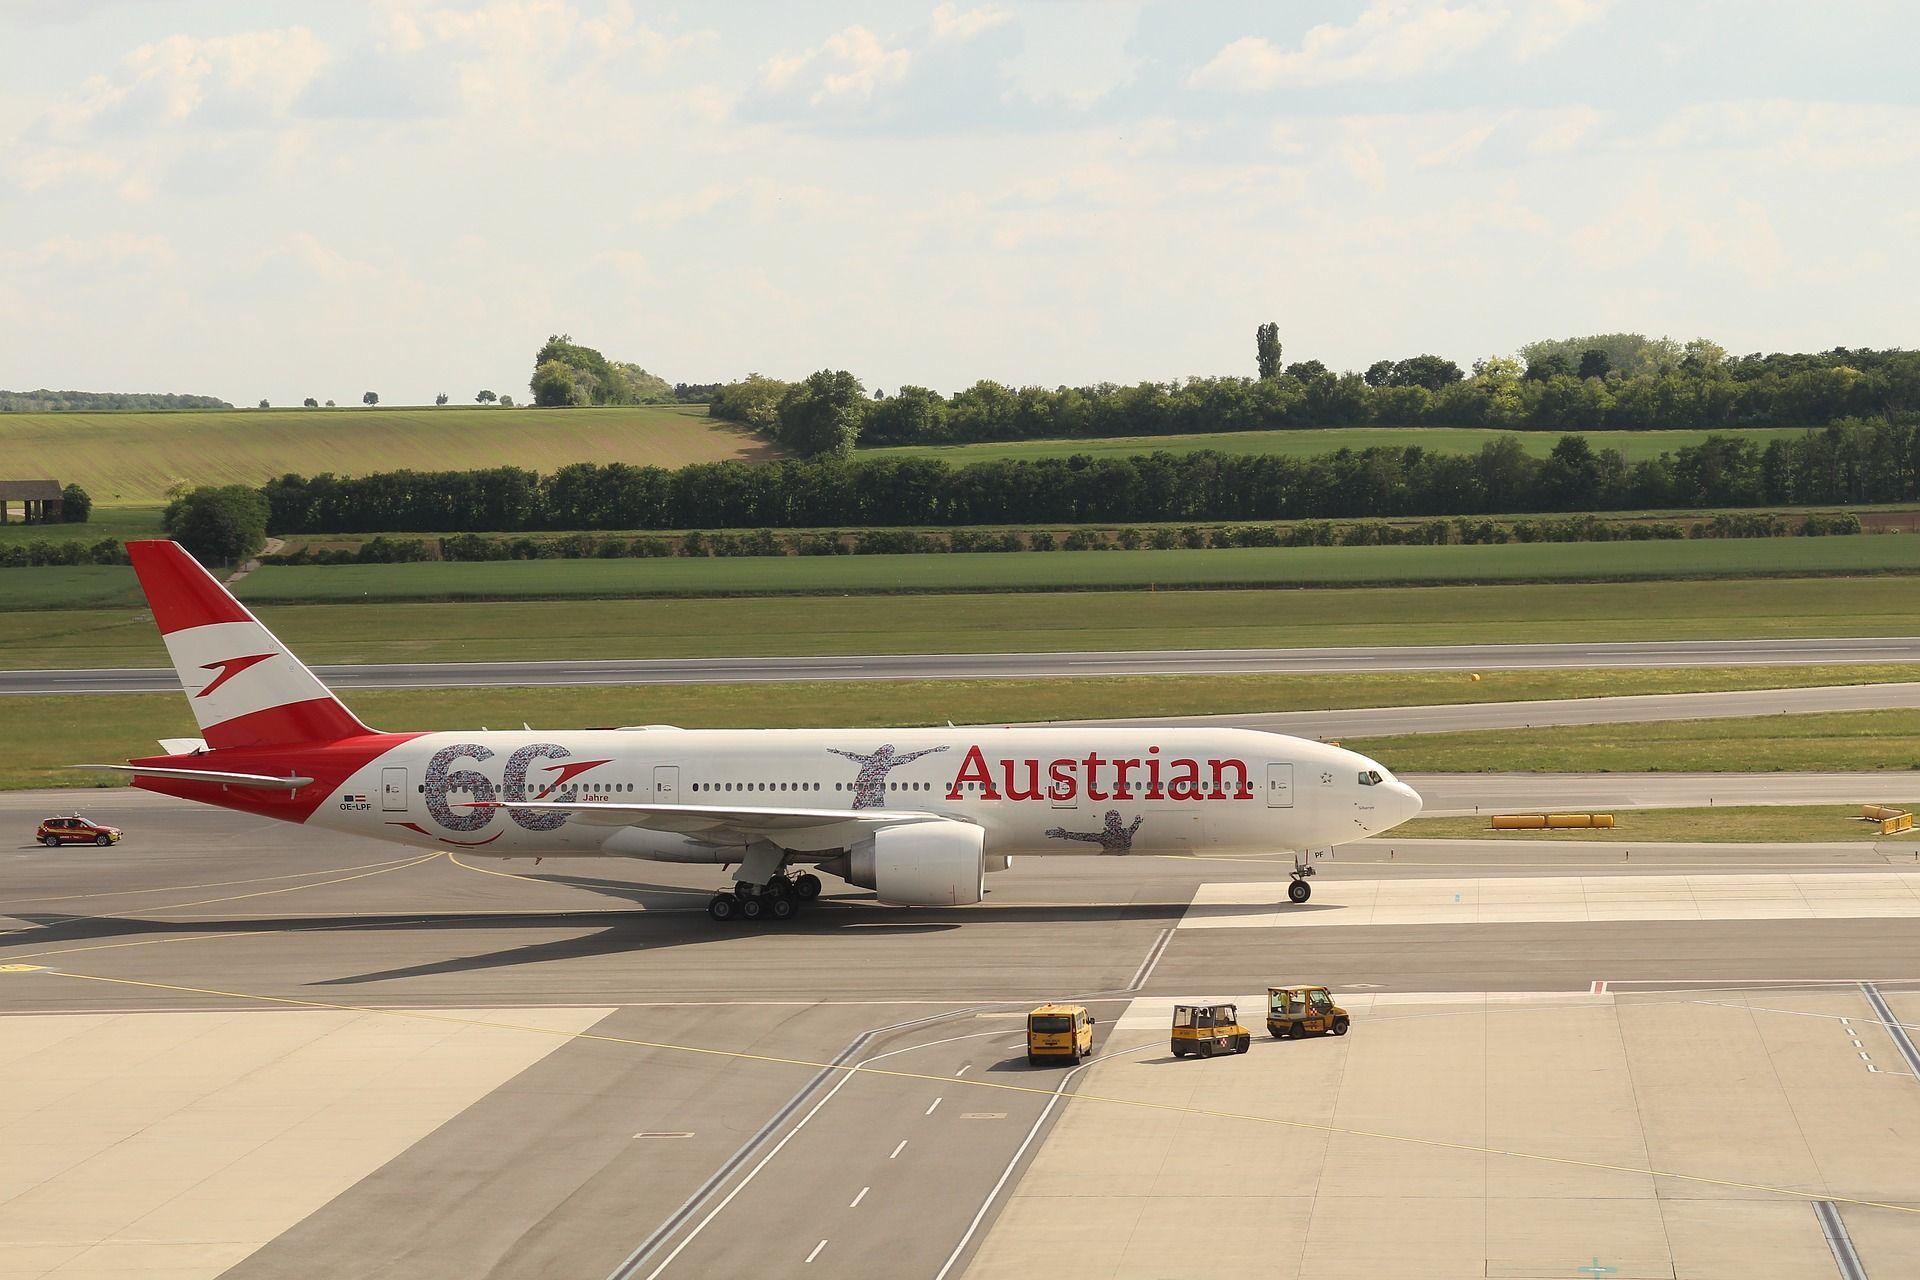 Boeing 777-200 společnosti Austrian Airlines ve Vídni. Foto: Biohacker76/Pixabay